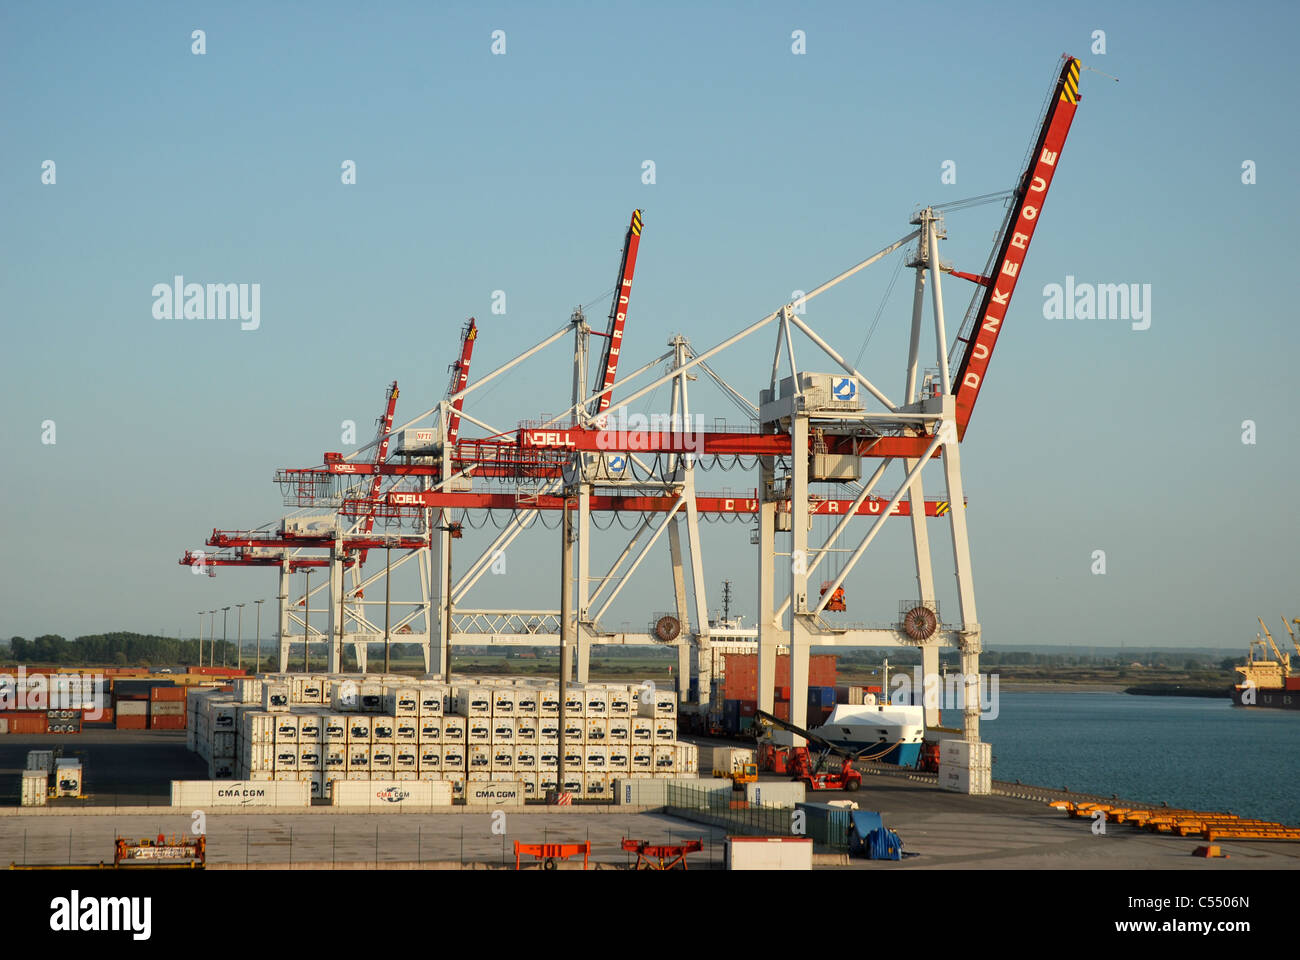 Port de dunkerque france stock photo royalty free image 37603965 alamy - Dunkirk port france address ...